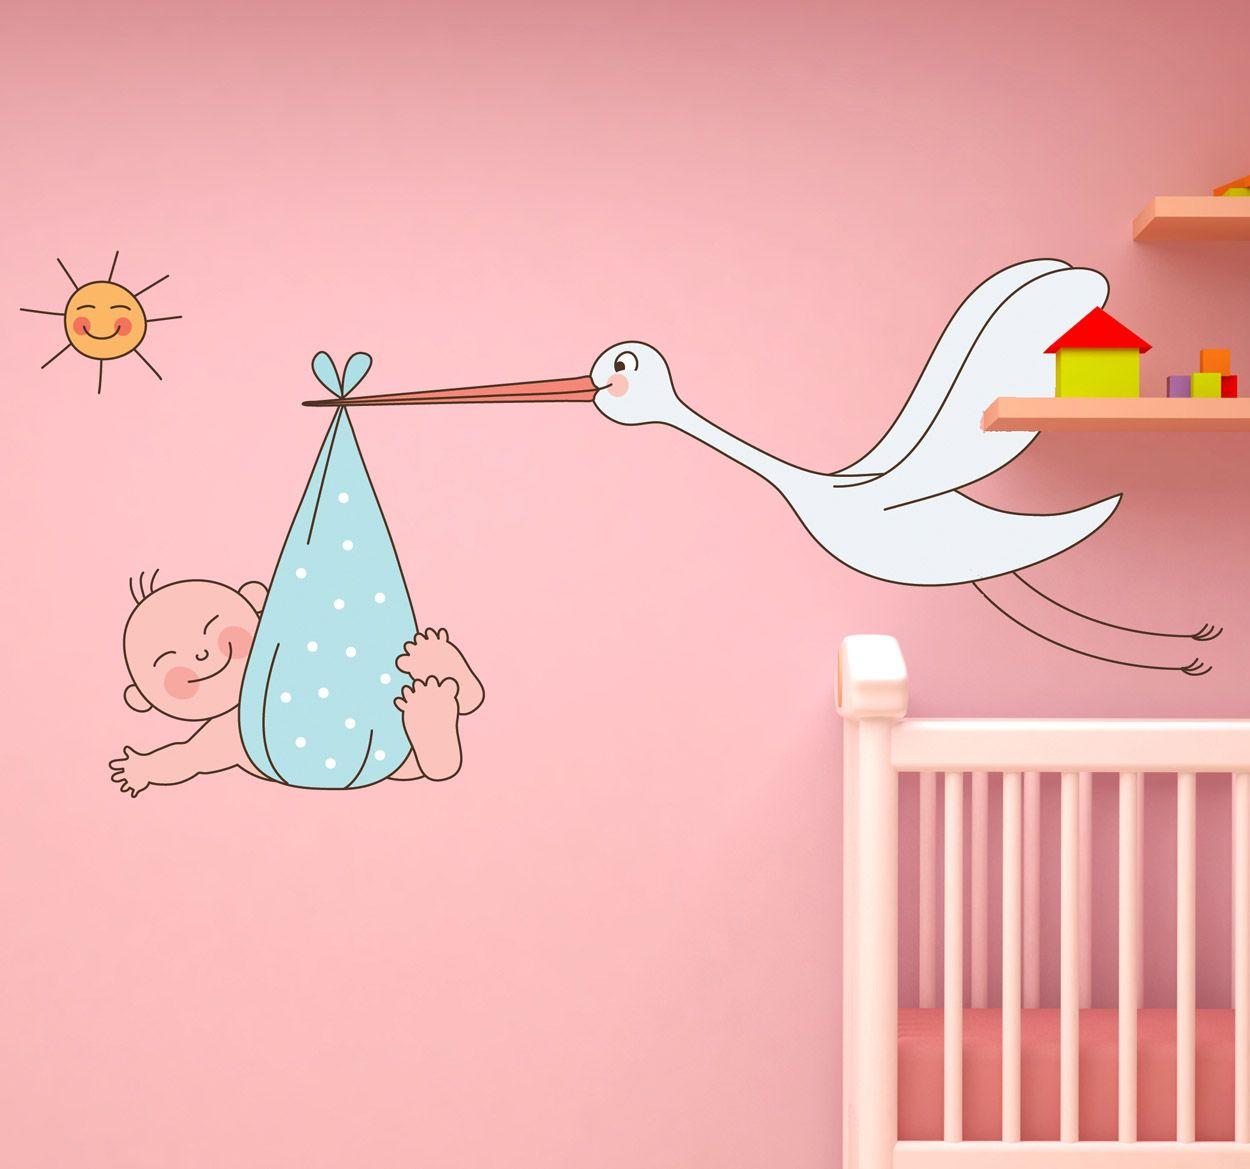 Idyllic Baby Wall Stickers - Furnithom